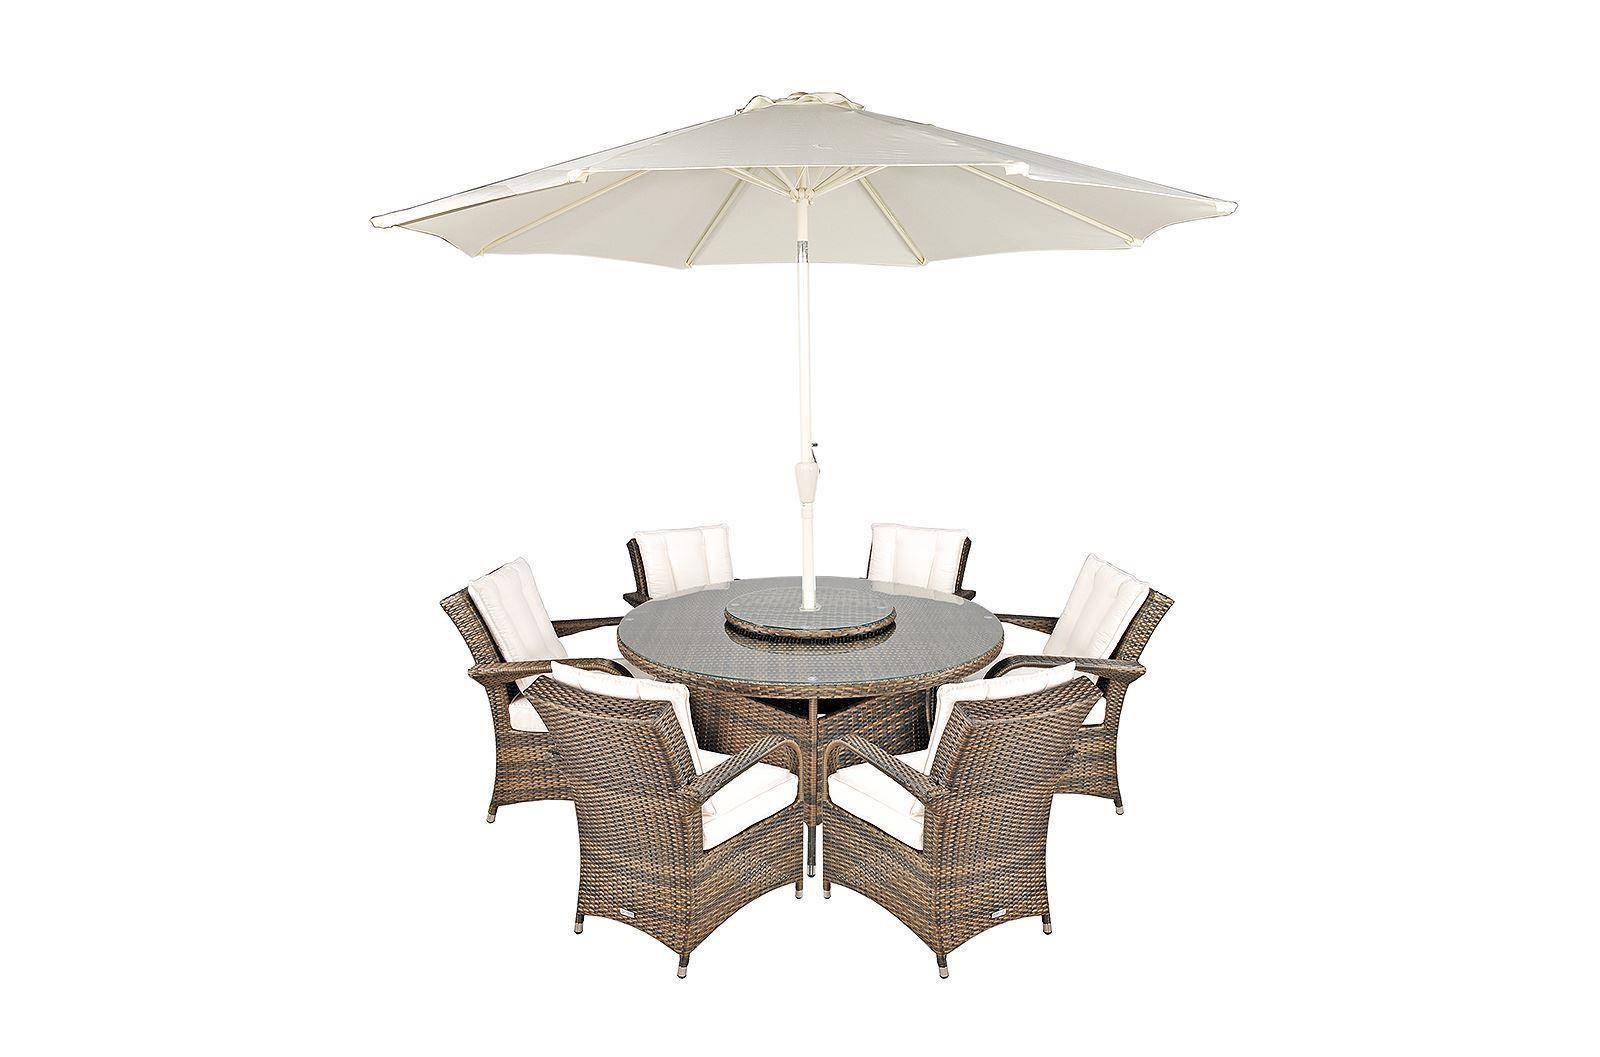 Arizona Rattan Garden Furniture [6 Seat Dining Set with Round Table]